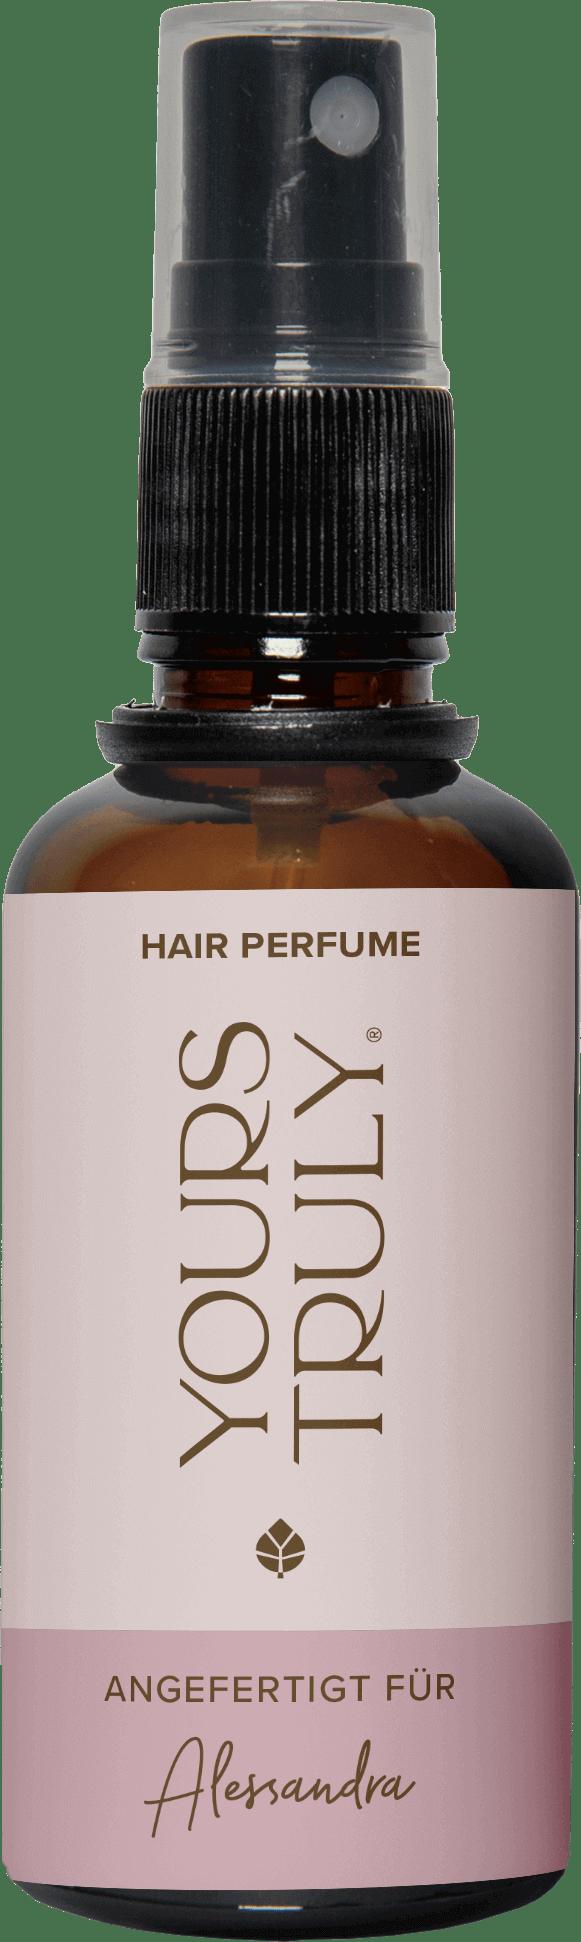 hairperfume